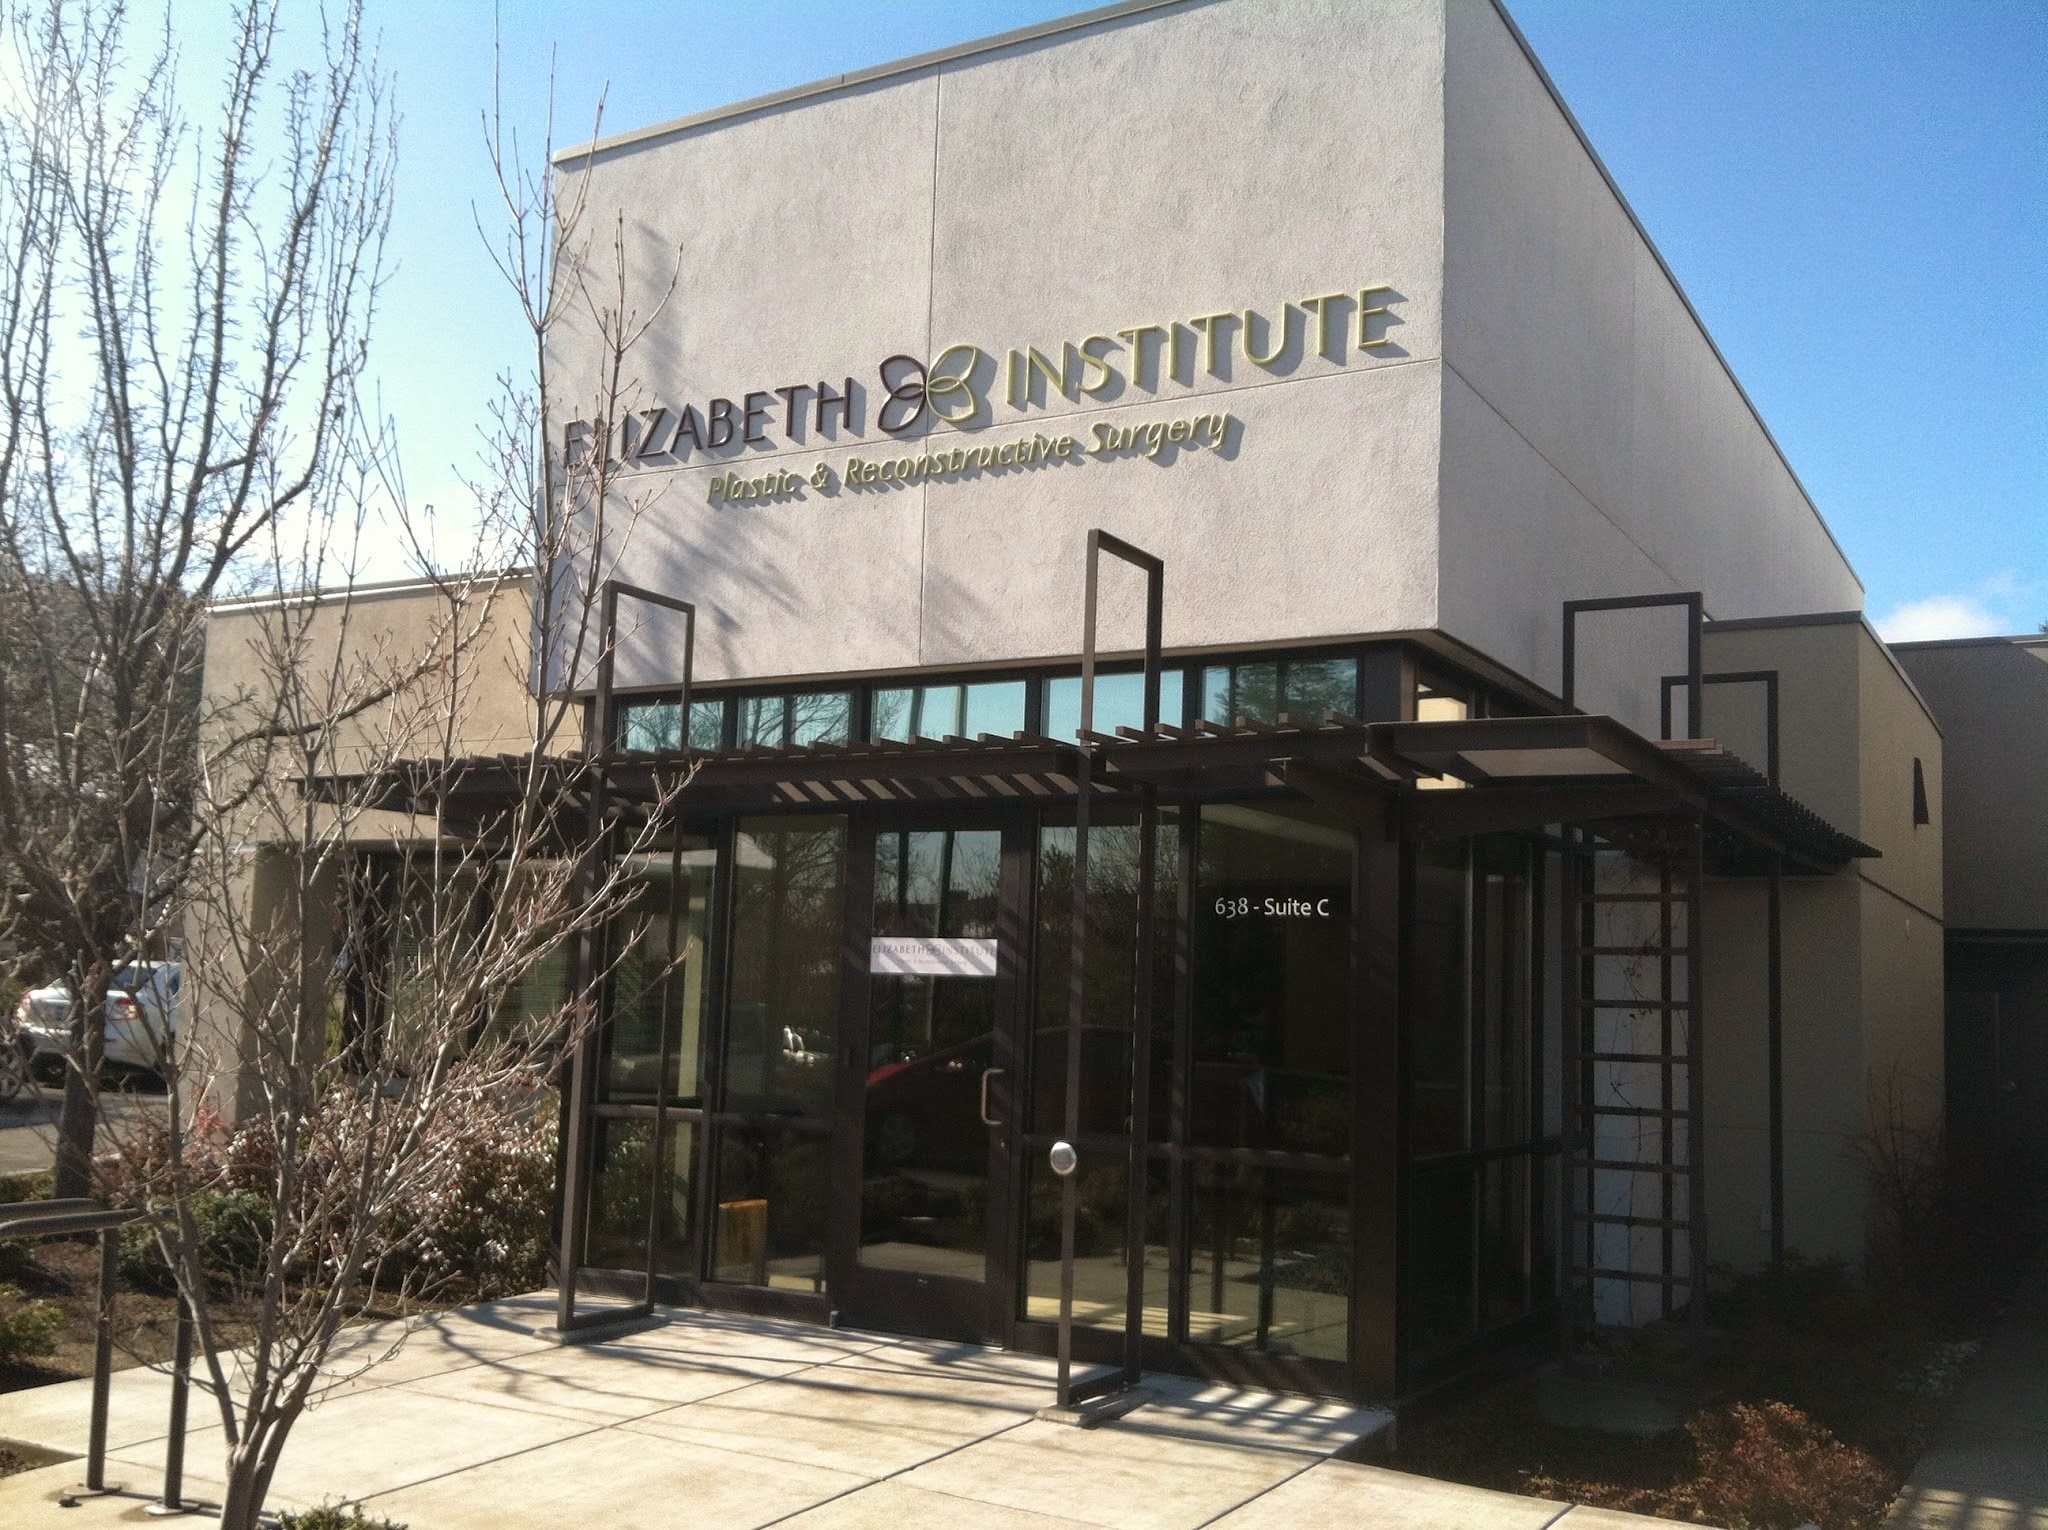 Elizabeth Institute, LLC - Plastic and Reconstructive Surgery | 638 N Main St Ste C, Ashland, OR, 97520 | +1 (541) 708-5433